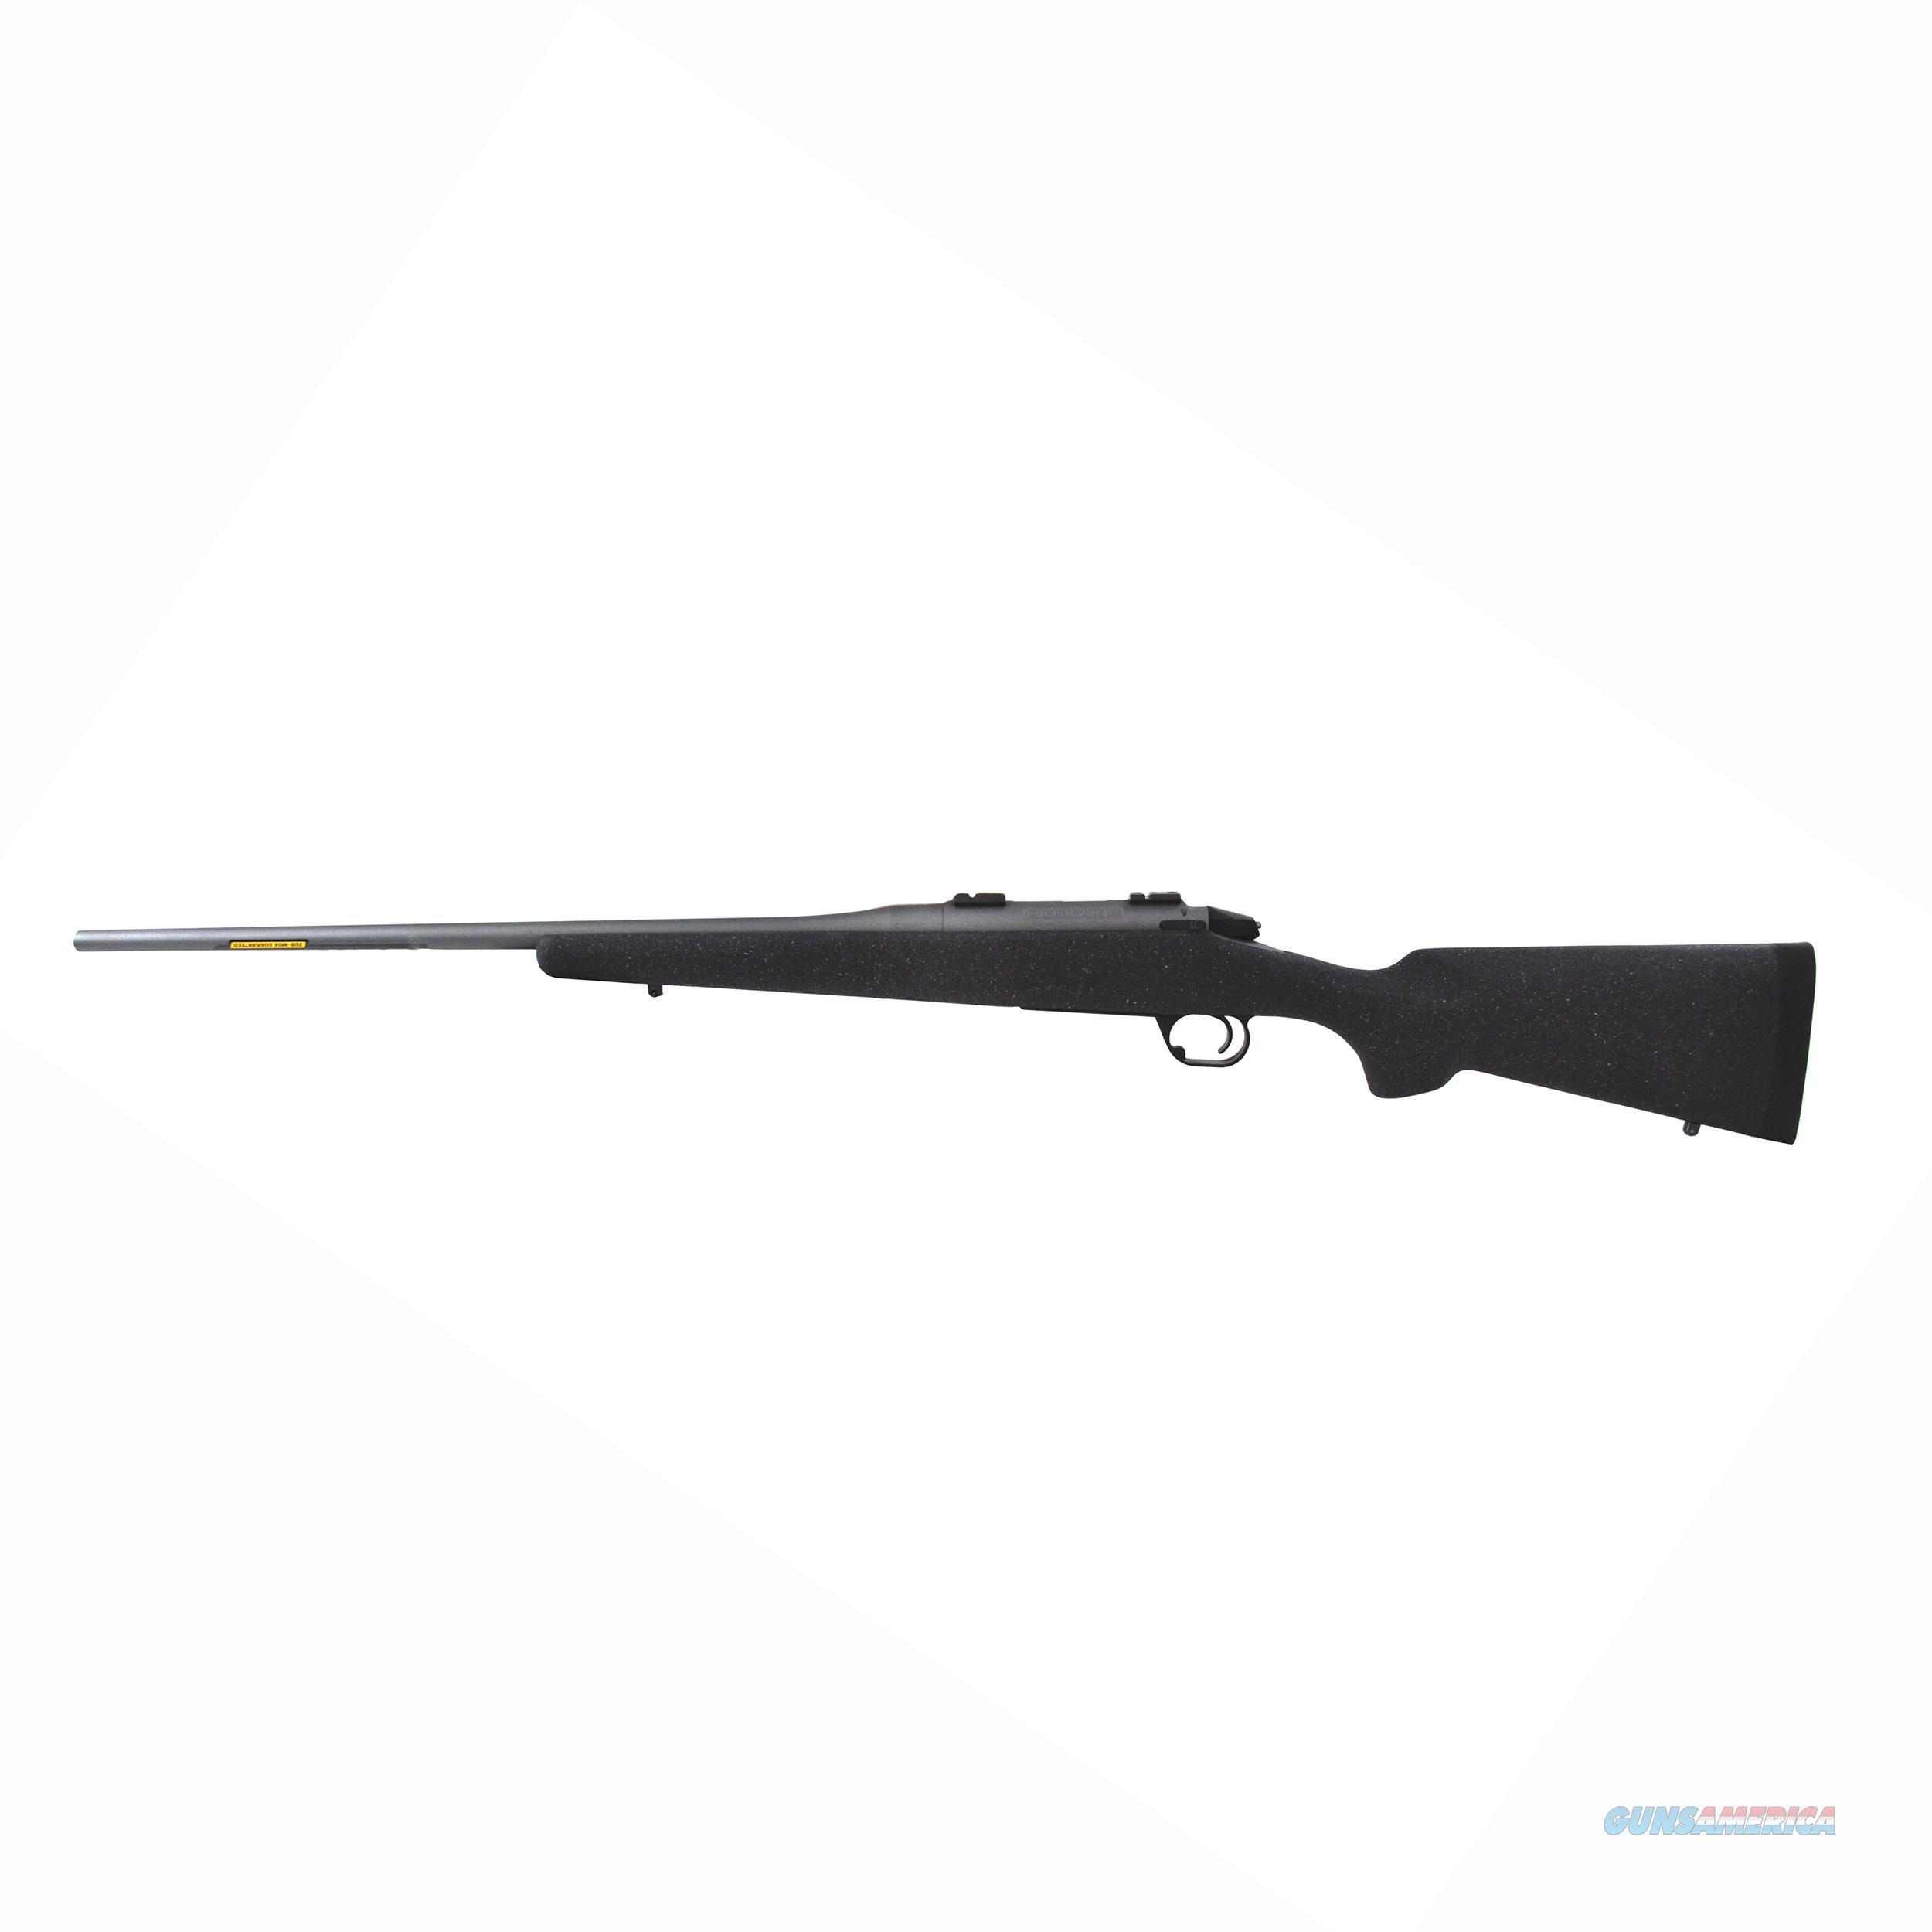 "Bergara Rifles Mountainrifle 6.5Mm Creedmoor, 22"" Barrel, Carbon Fiber Stock BPR18-65F  Guns > Rifles > B Misc Rifles"